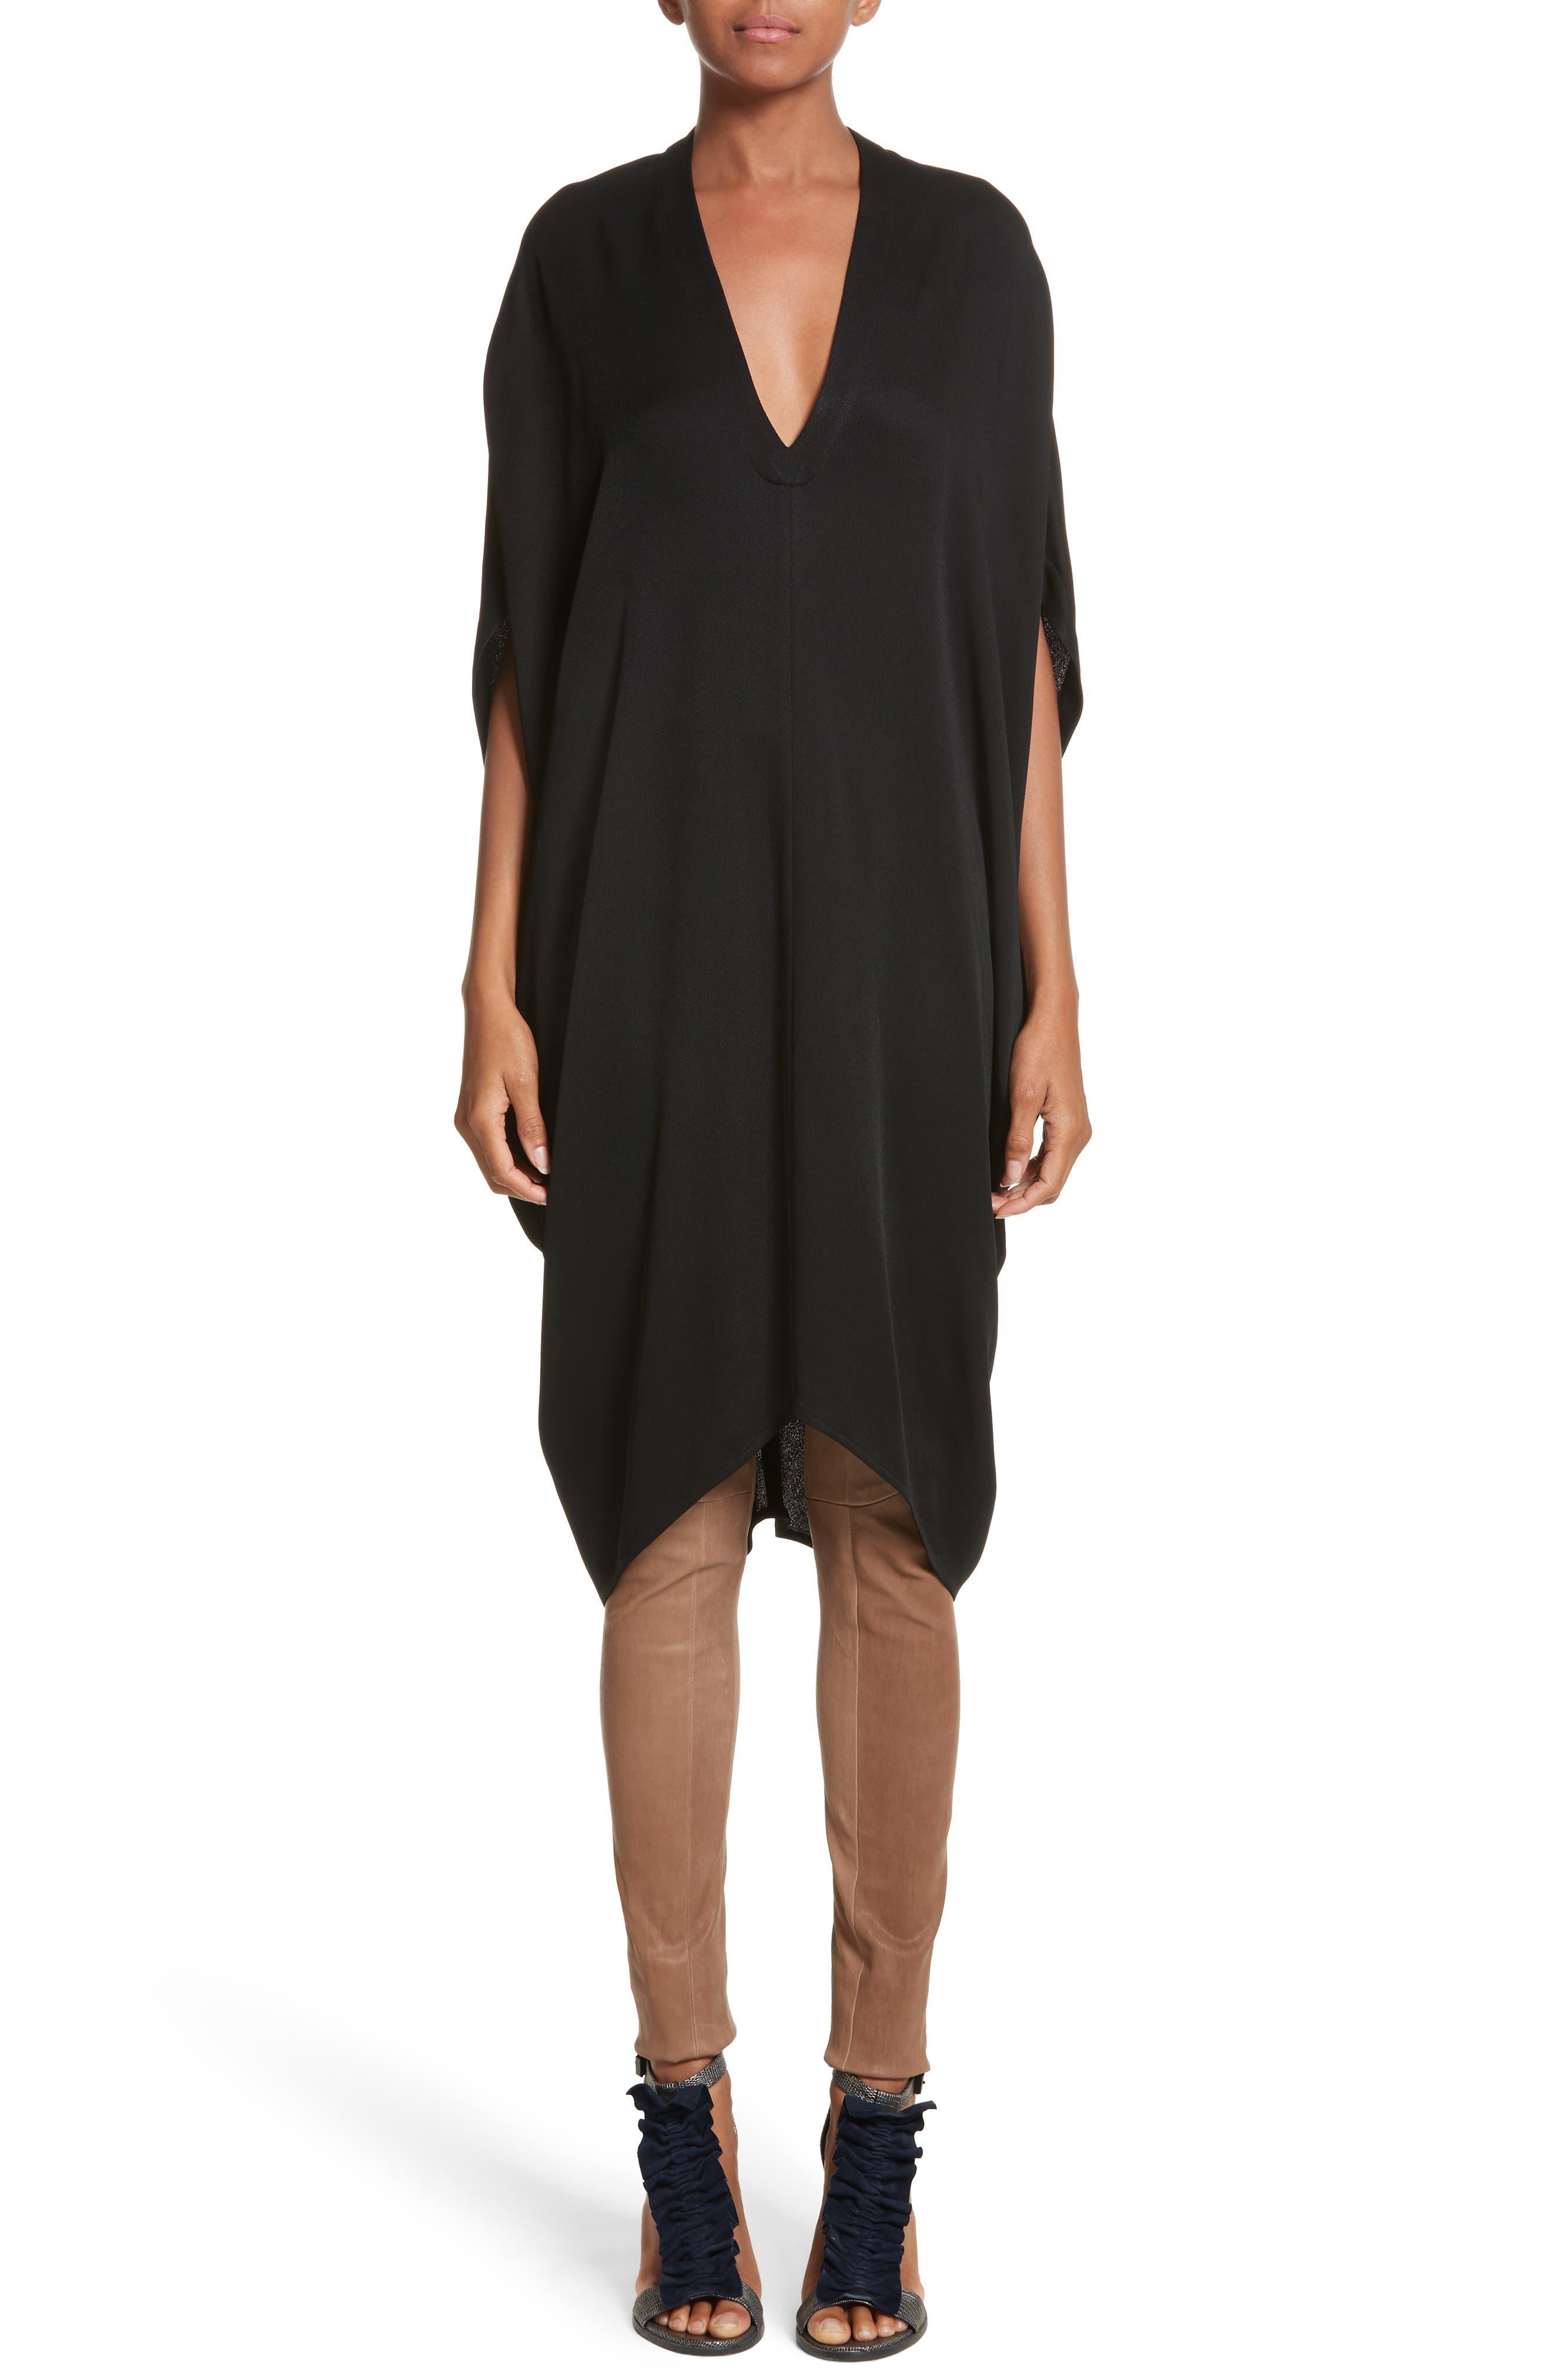 Eco Drape Dress,                             Main thumbnail 1, color,                             001